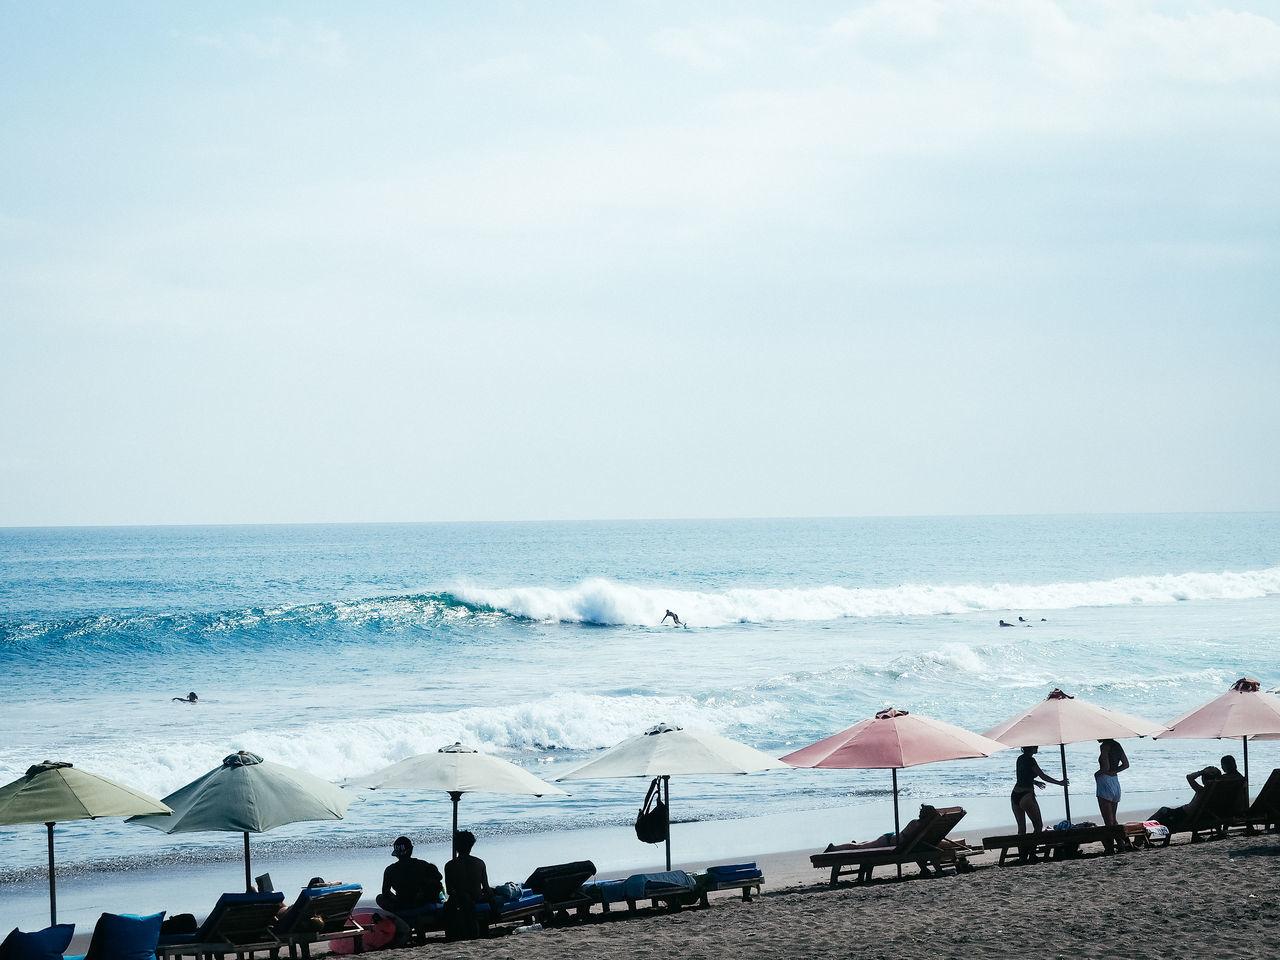 Vacation Feels Bali Bali Beach Beach Beach Umbrella Beachphotography Canggu Coastline Colourful Umberella Horizon Over Water Sea Surfer Surfing Tourist Traveling Umbrealls Vacation Waves